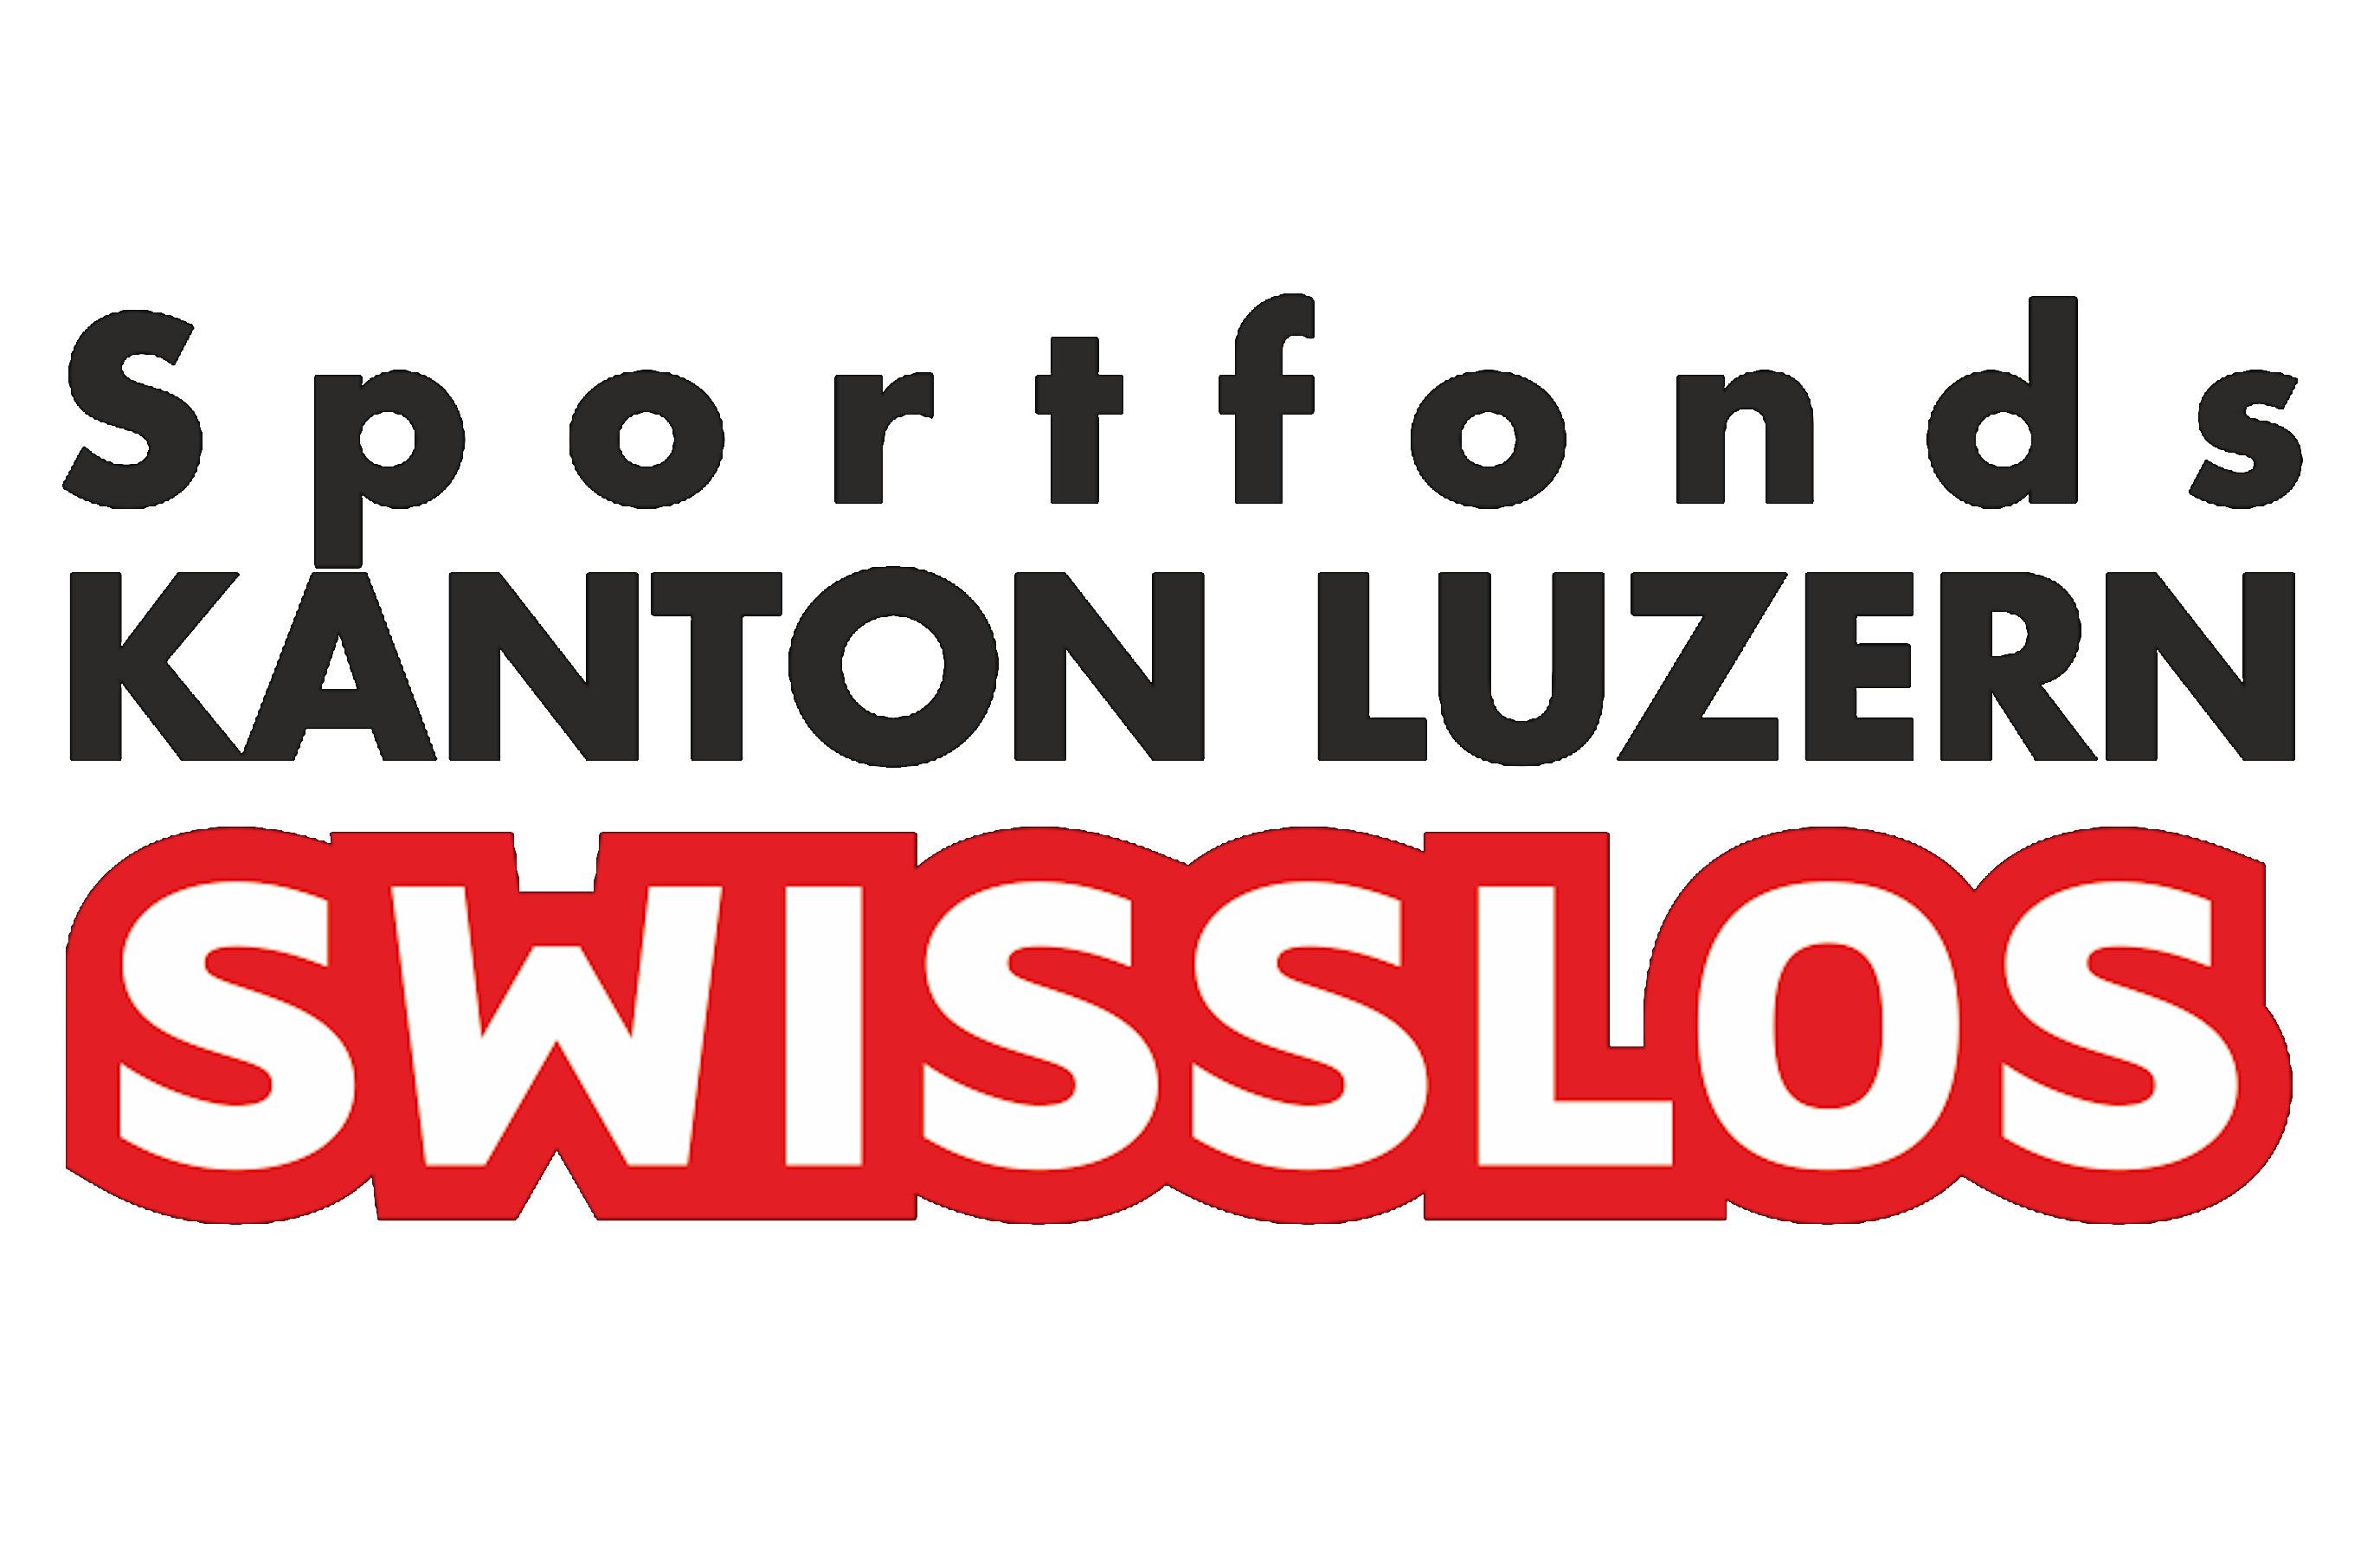 Swisslos - Sportfonds Kanton Luzern